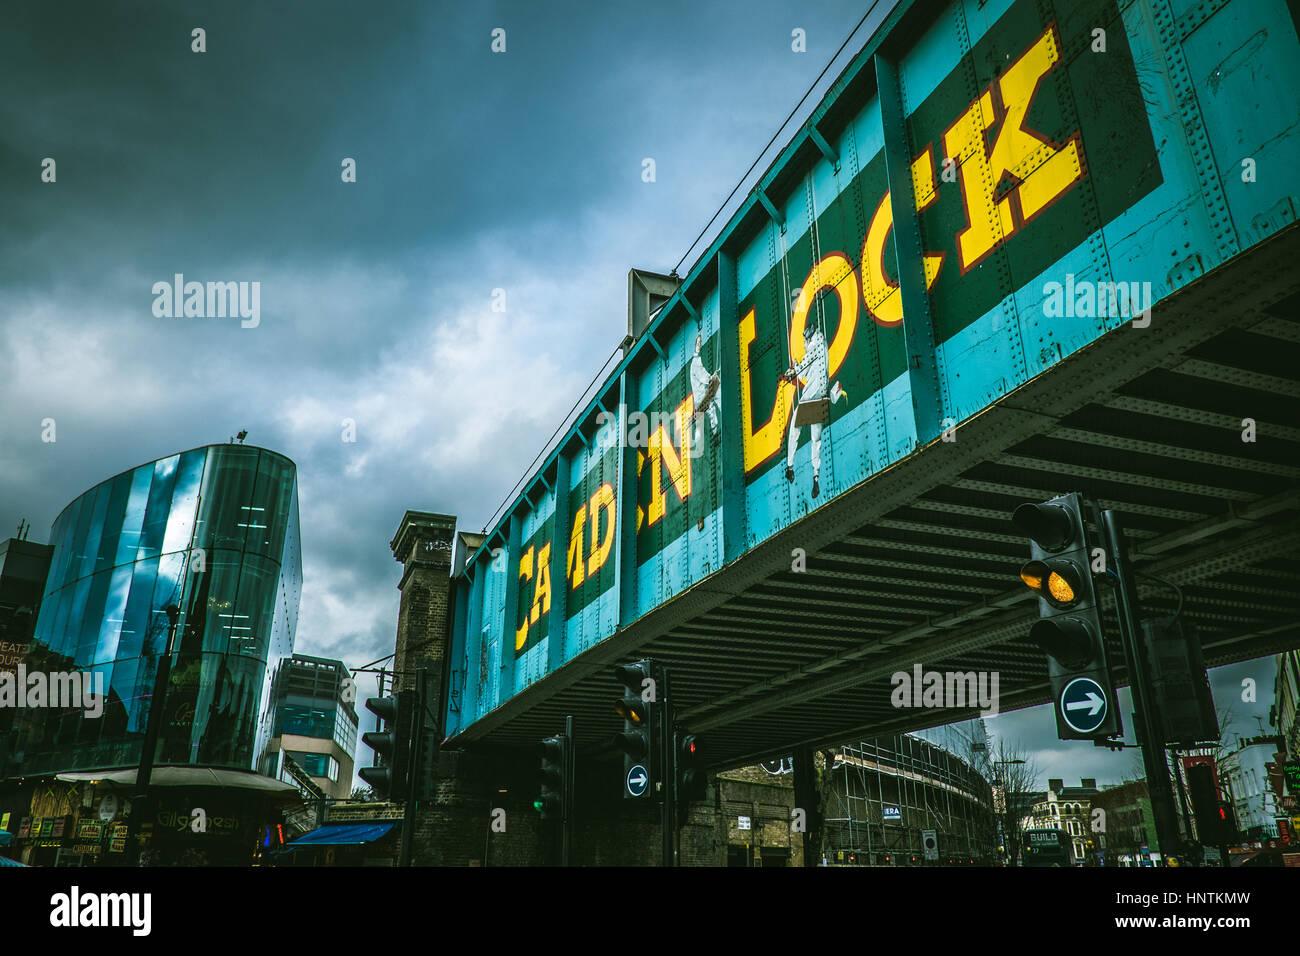 Camden Lock bridge - Stock Image